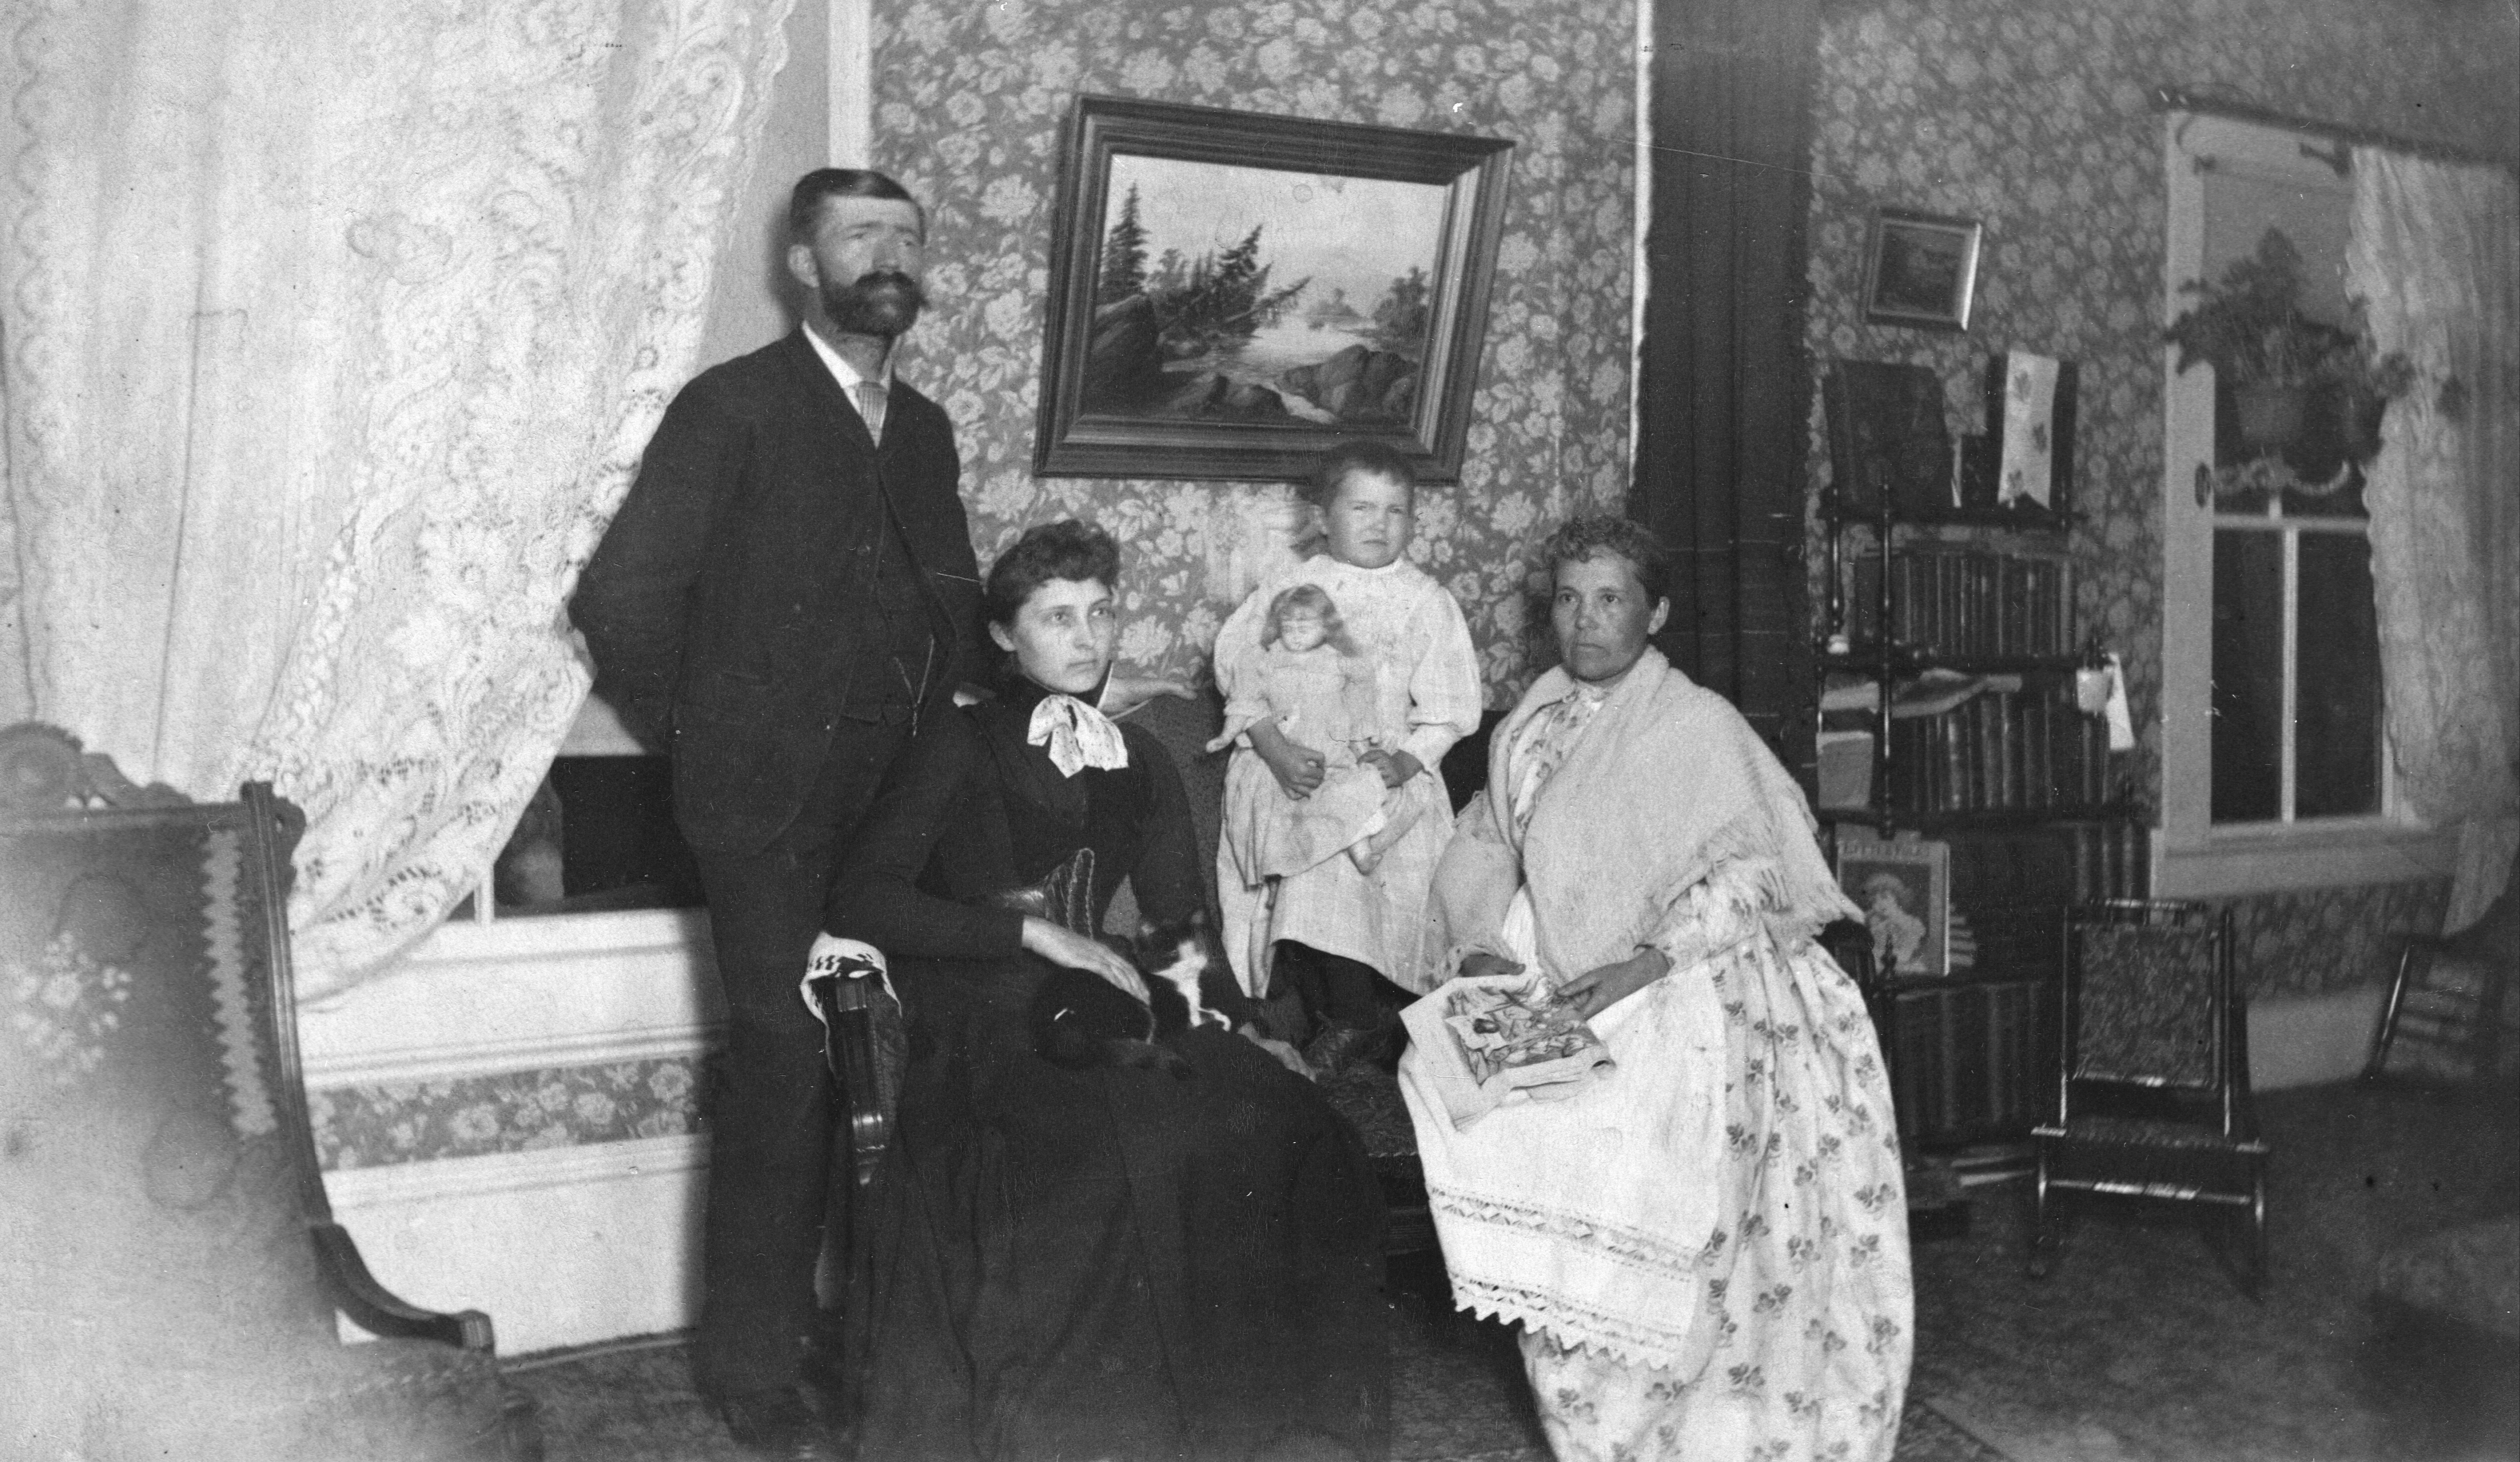 EB White and family flash light photo